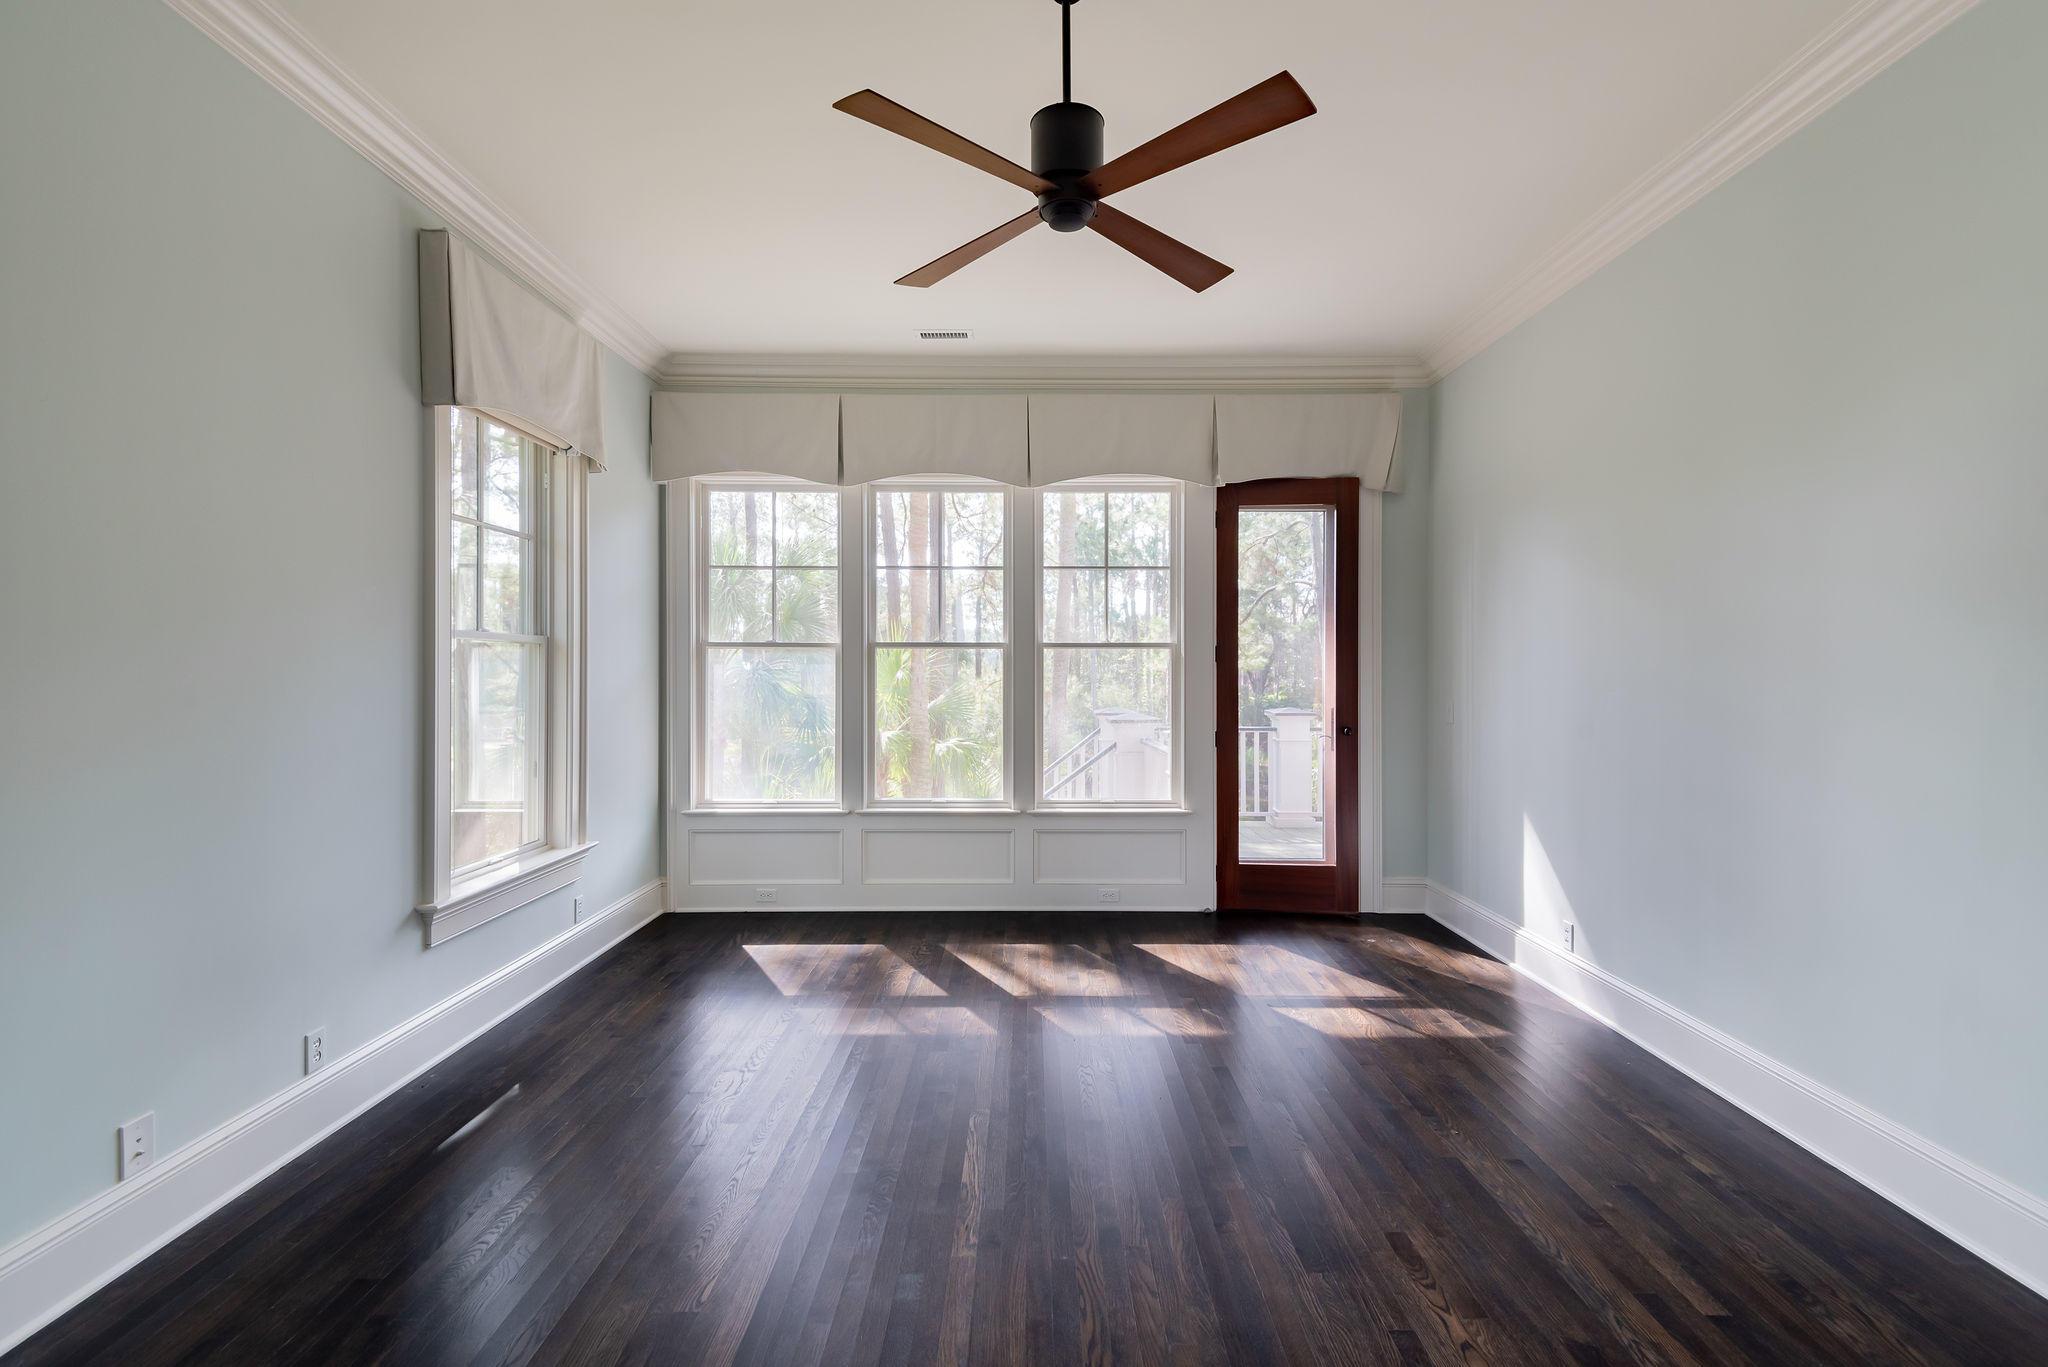 Kiawah Island Homes For Sale - 3 Grey Widgeon, Kiawah Island, SC - 41